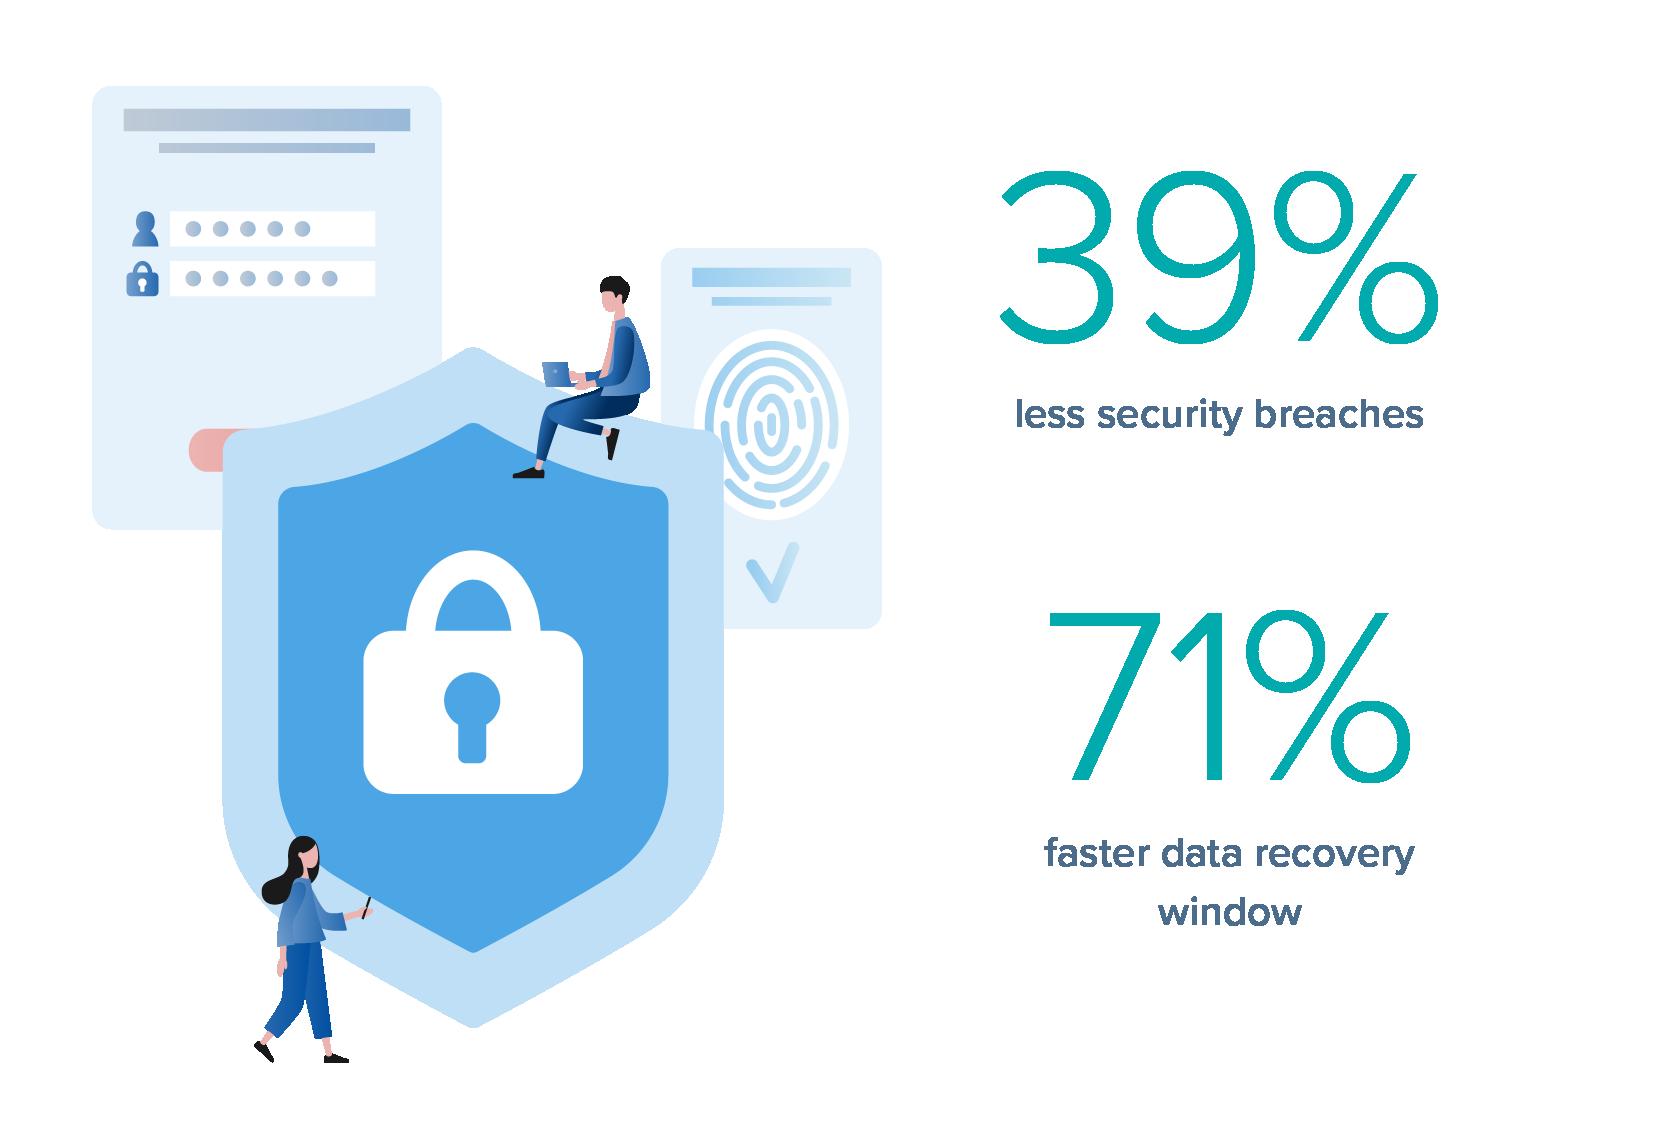 Data protection benefits statistics